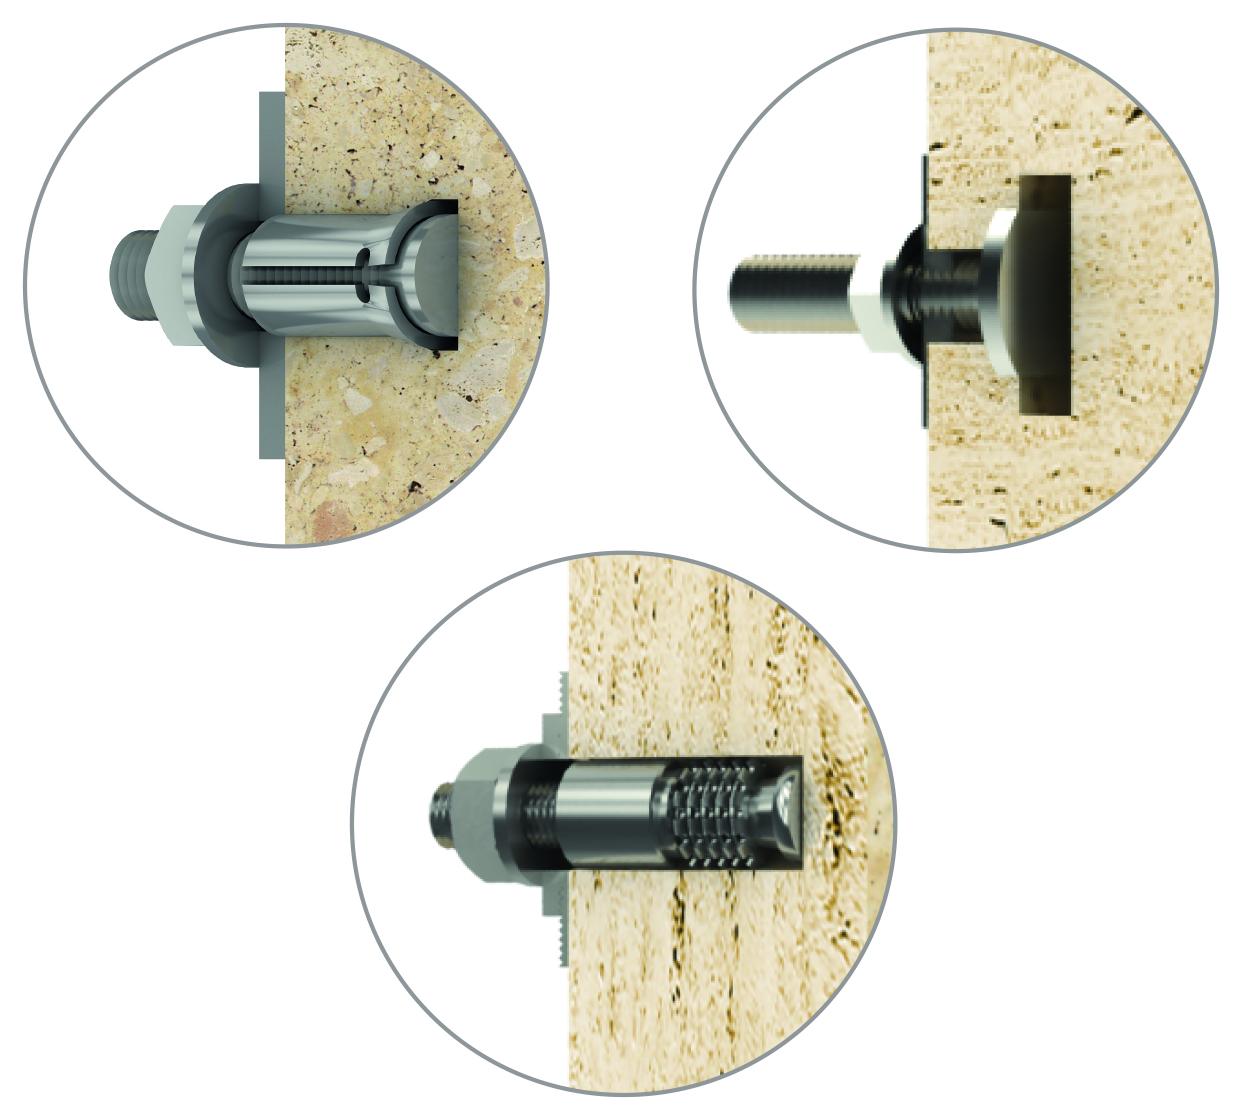 Undercut bolts